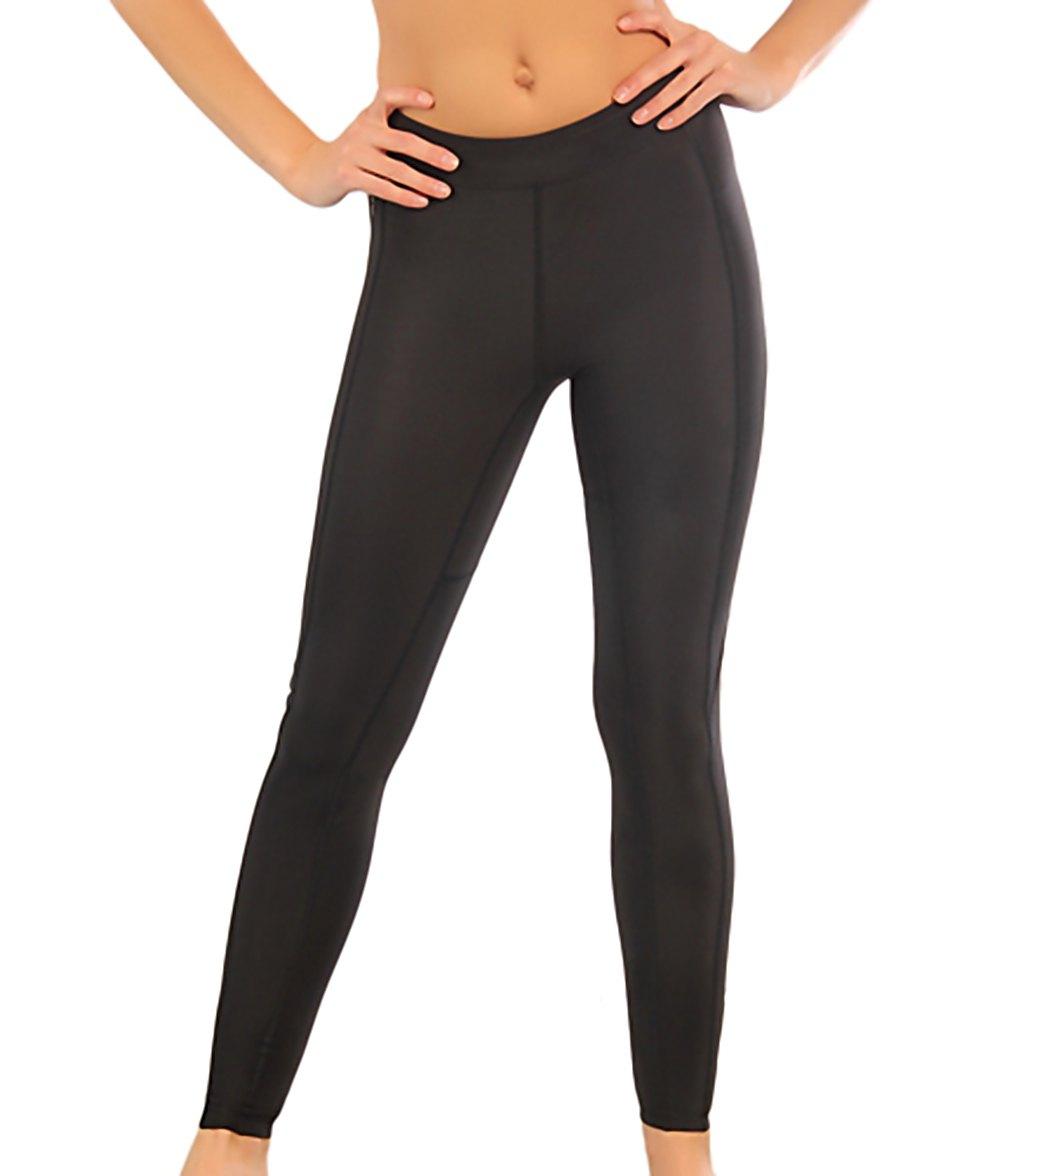 93a347a1b1cf2 SKINS Women's A200 Compression Long Tights at SwimOutlet.com ...